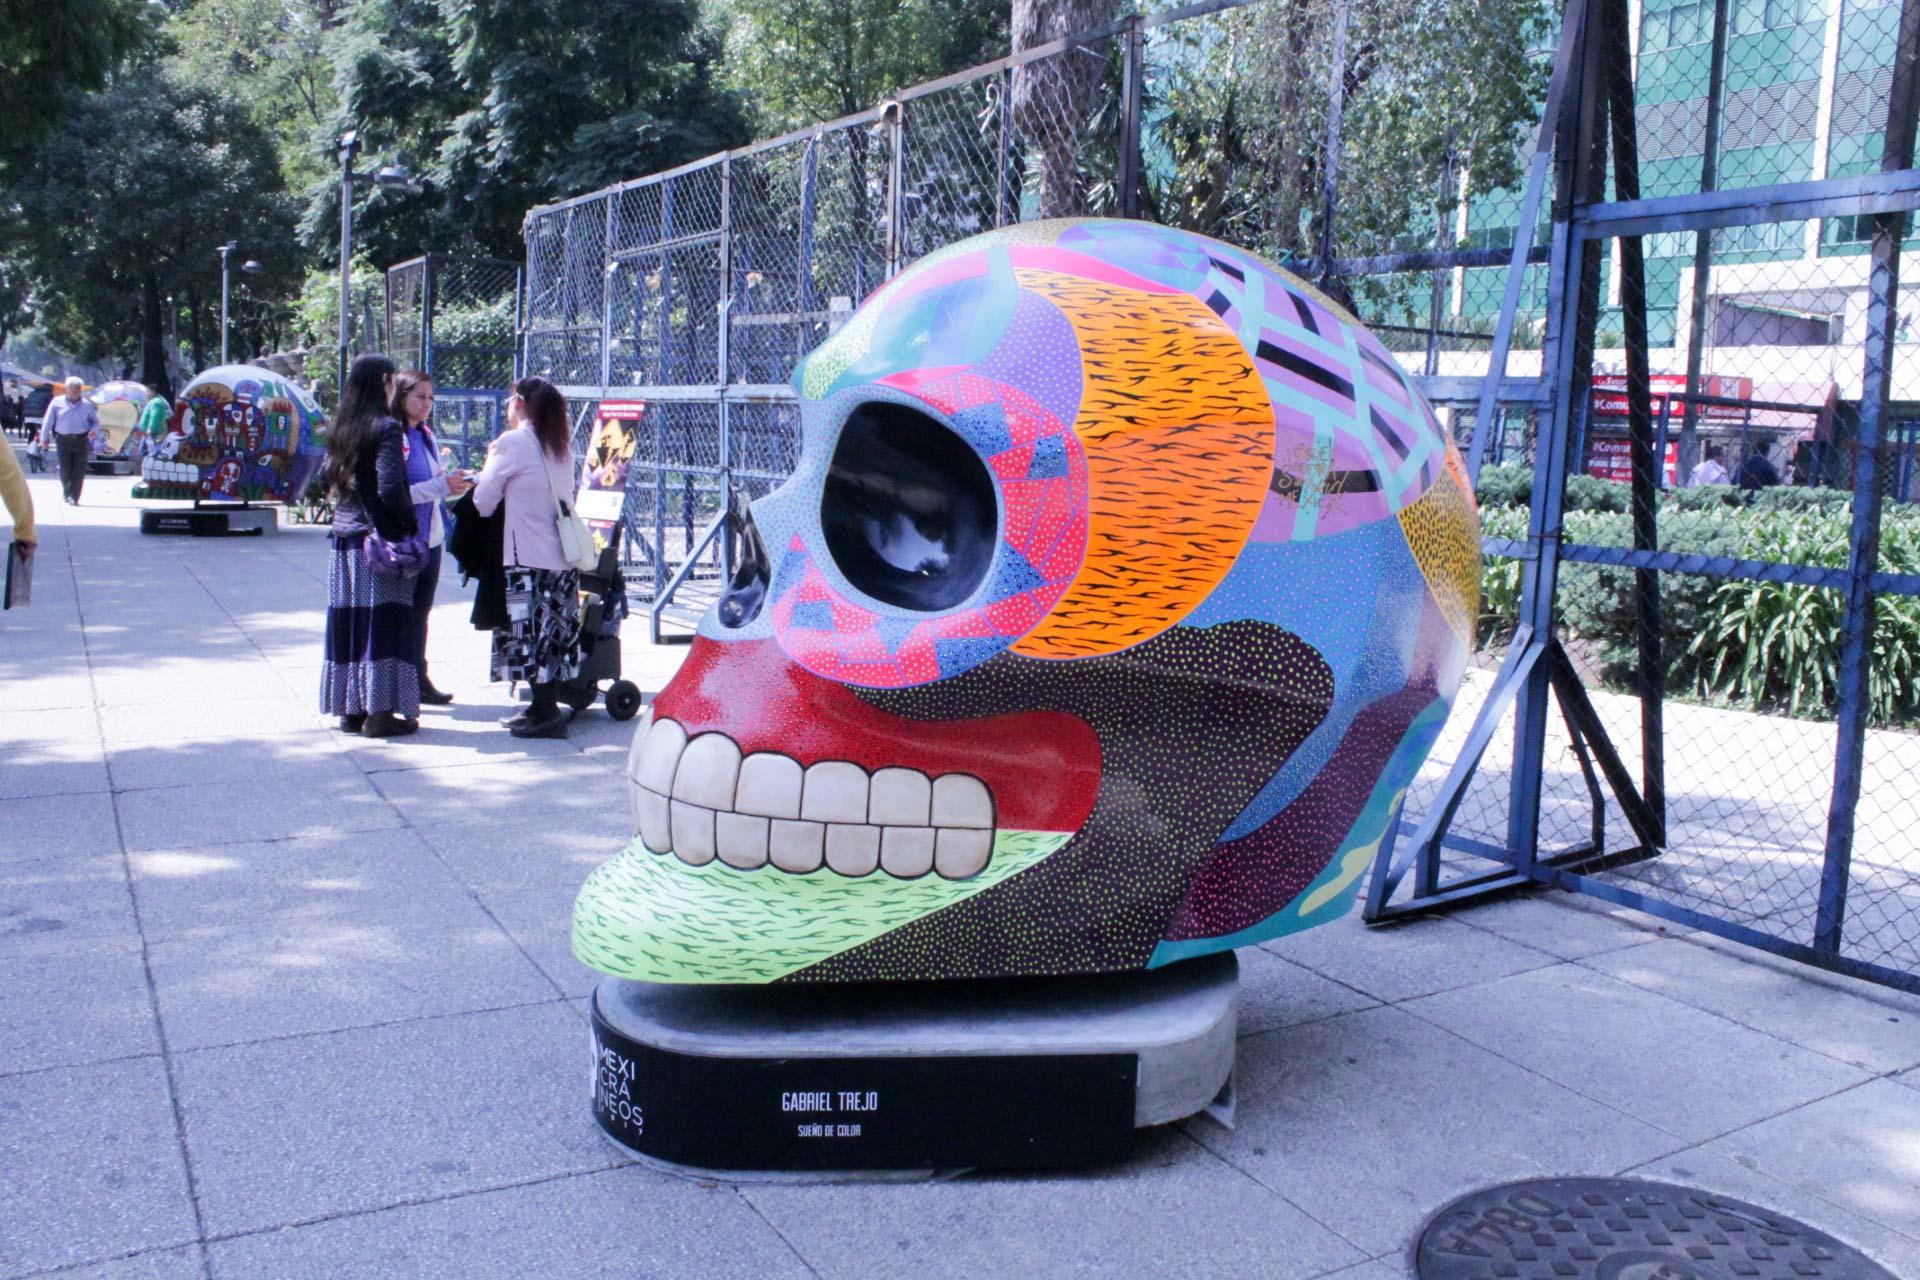 mexico-city-10-2017-56.jpg